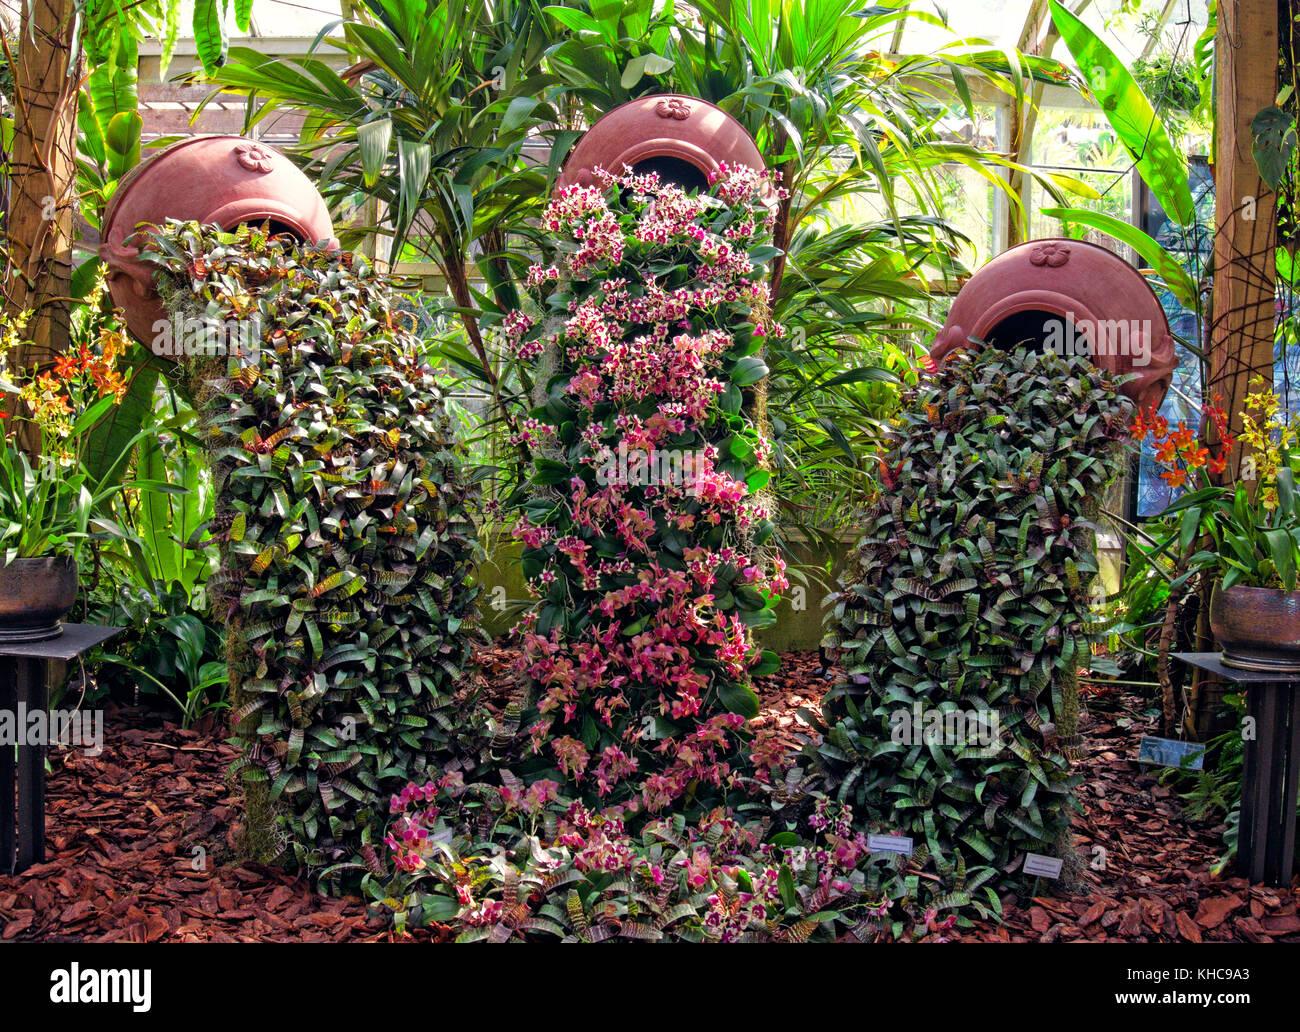 Greenhouse display - Marie Selby Botanical Gardens, Sarasota FL - Stock Image